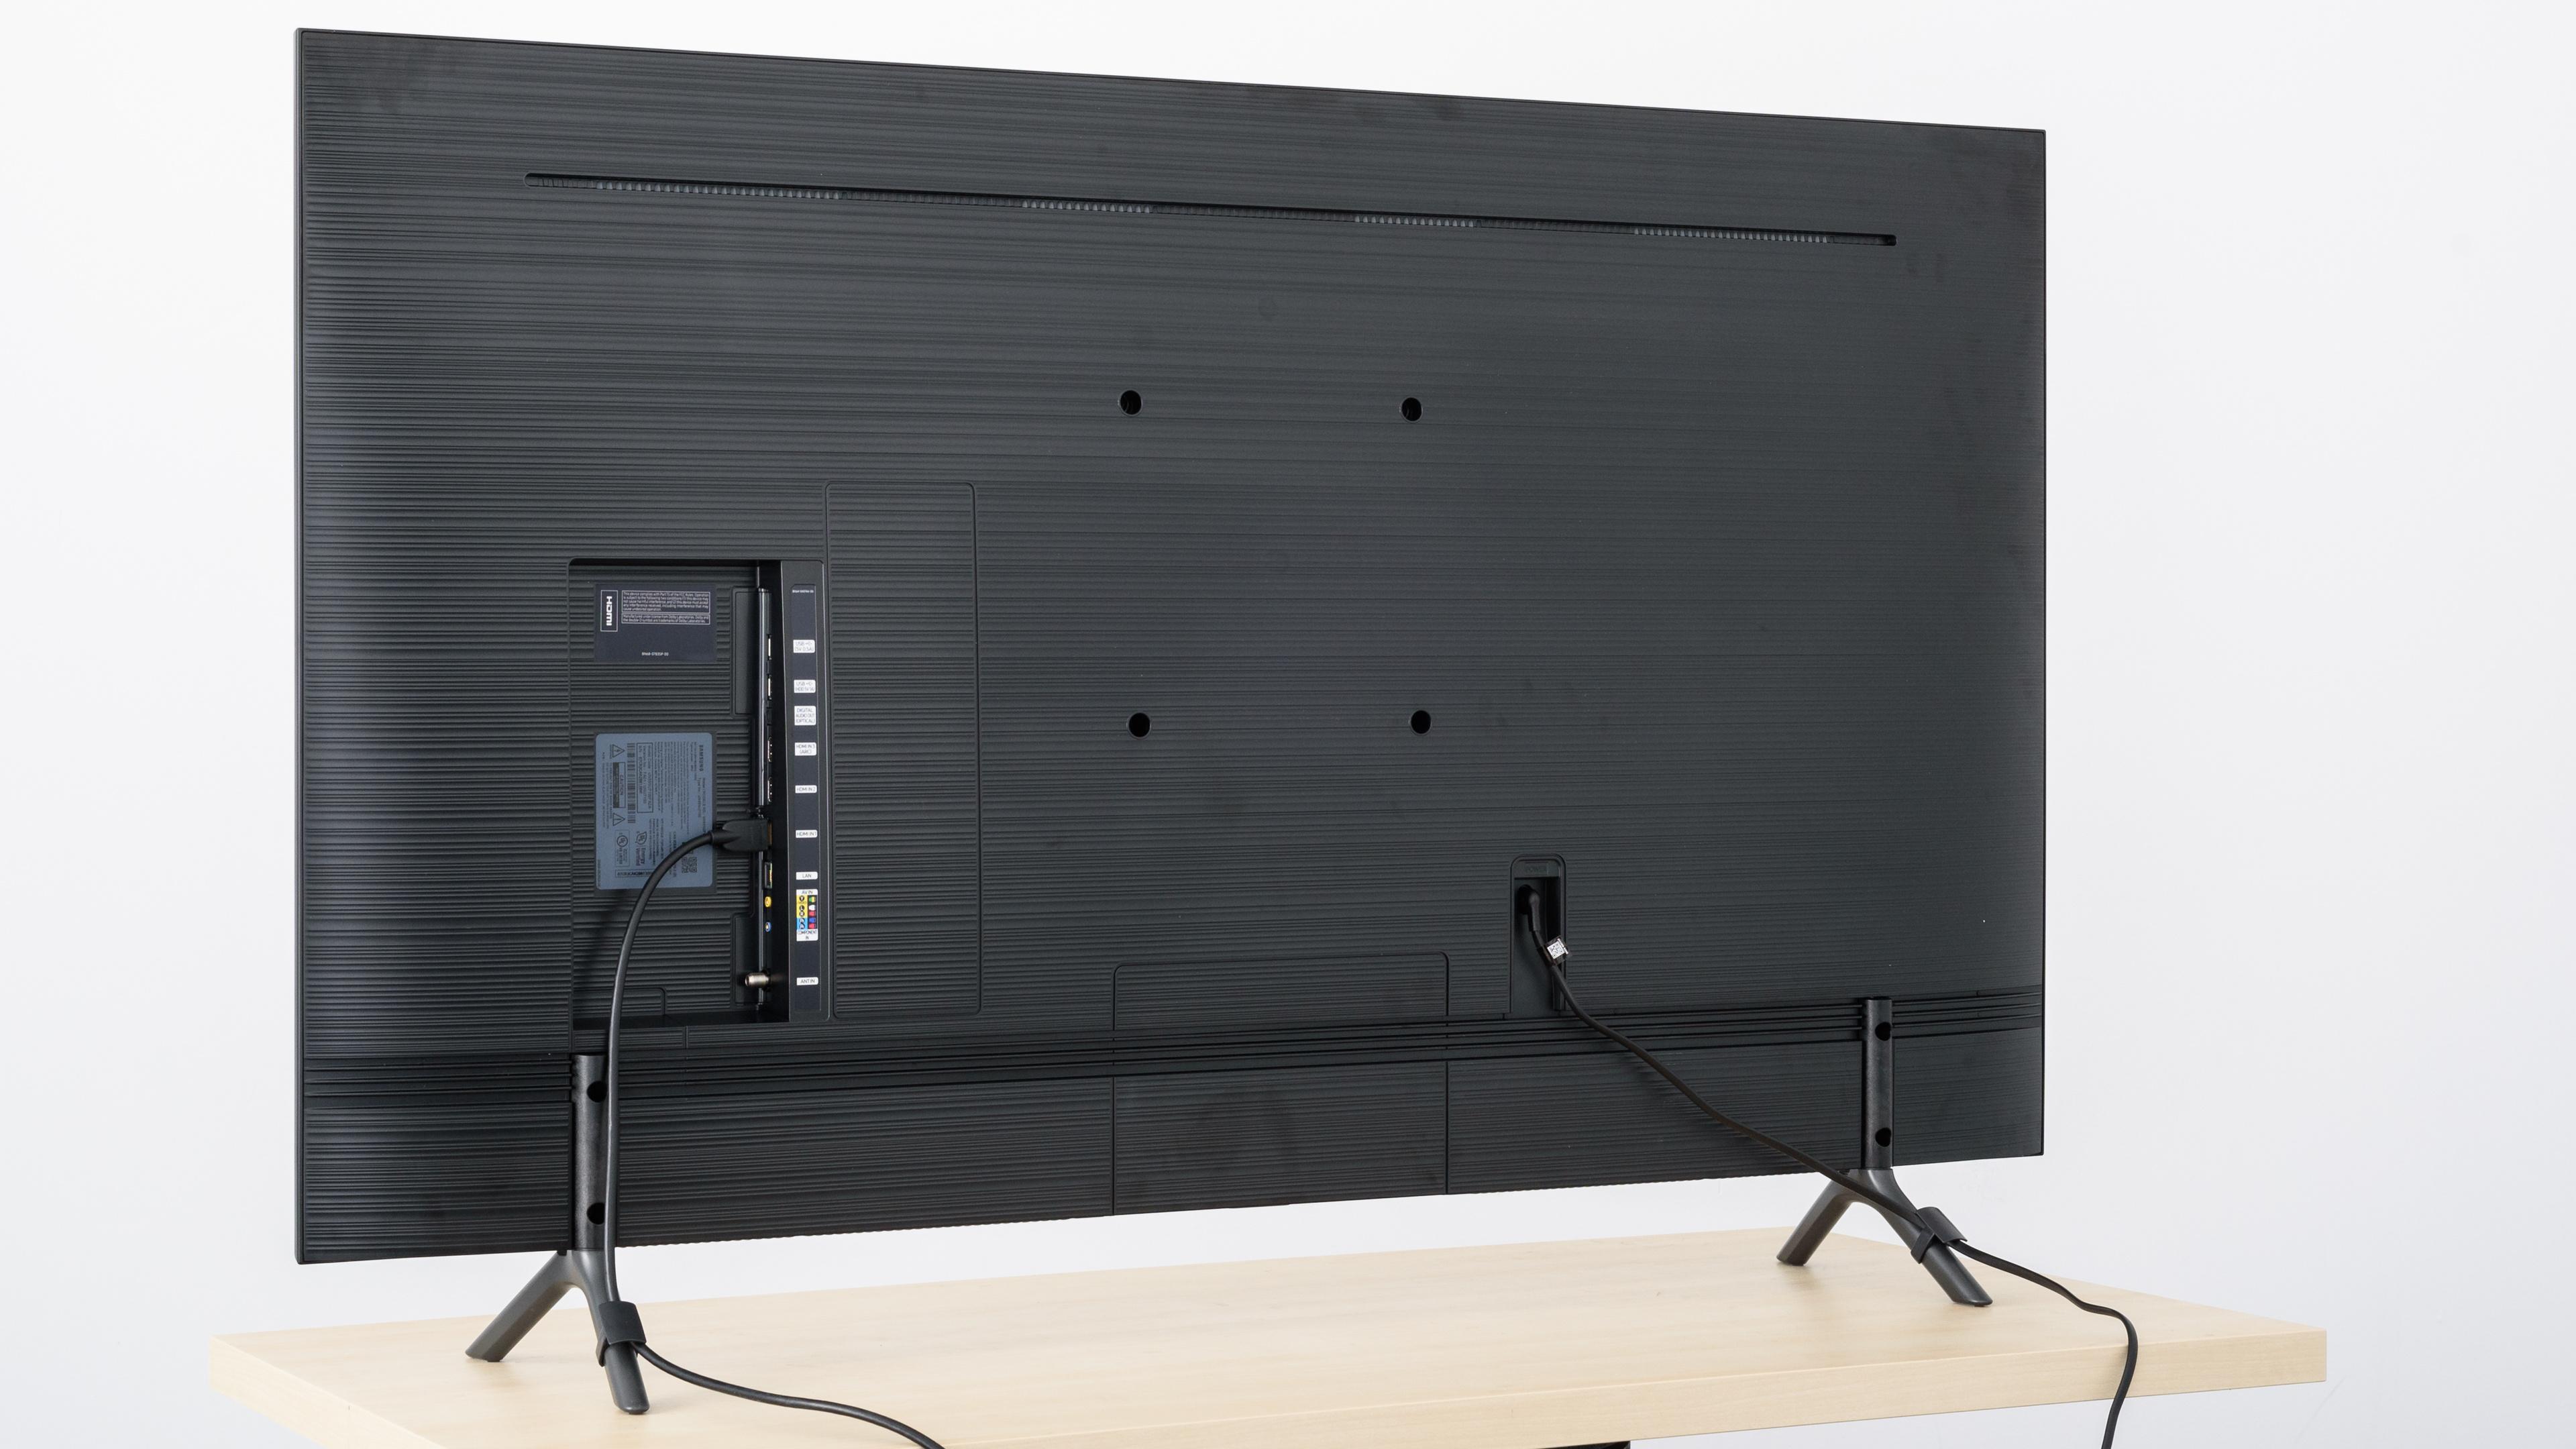 Samsung Sound Bar Wall Mount Bracket Lovequilts